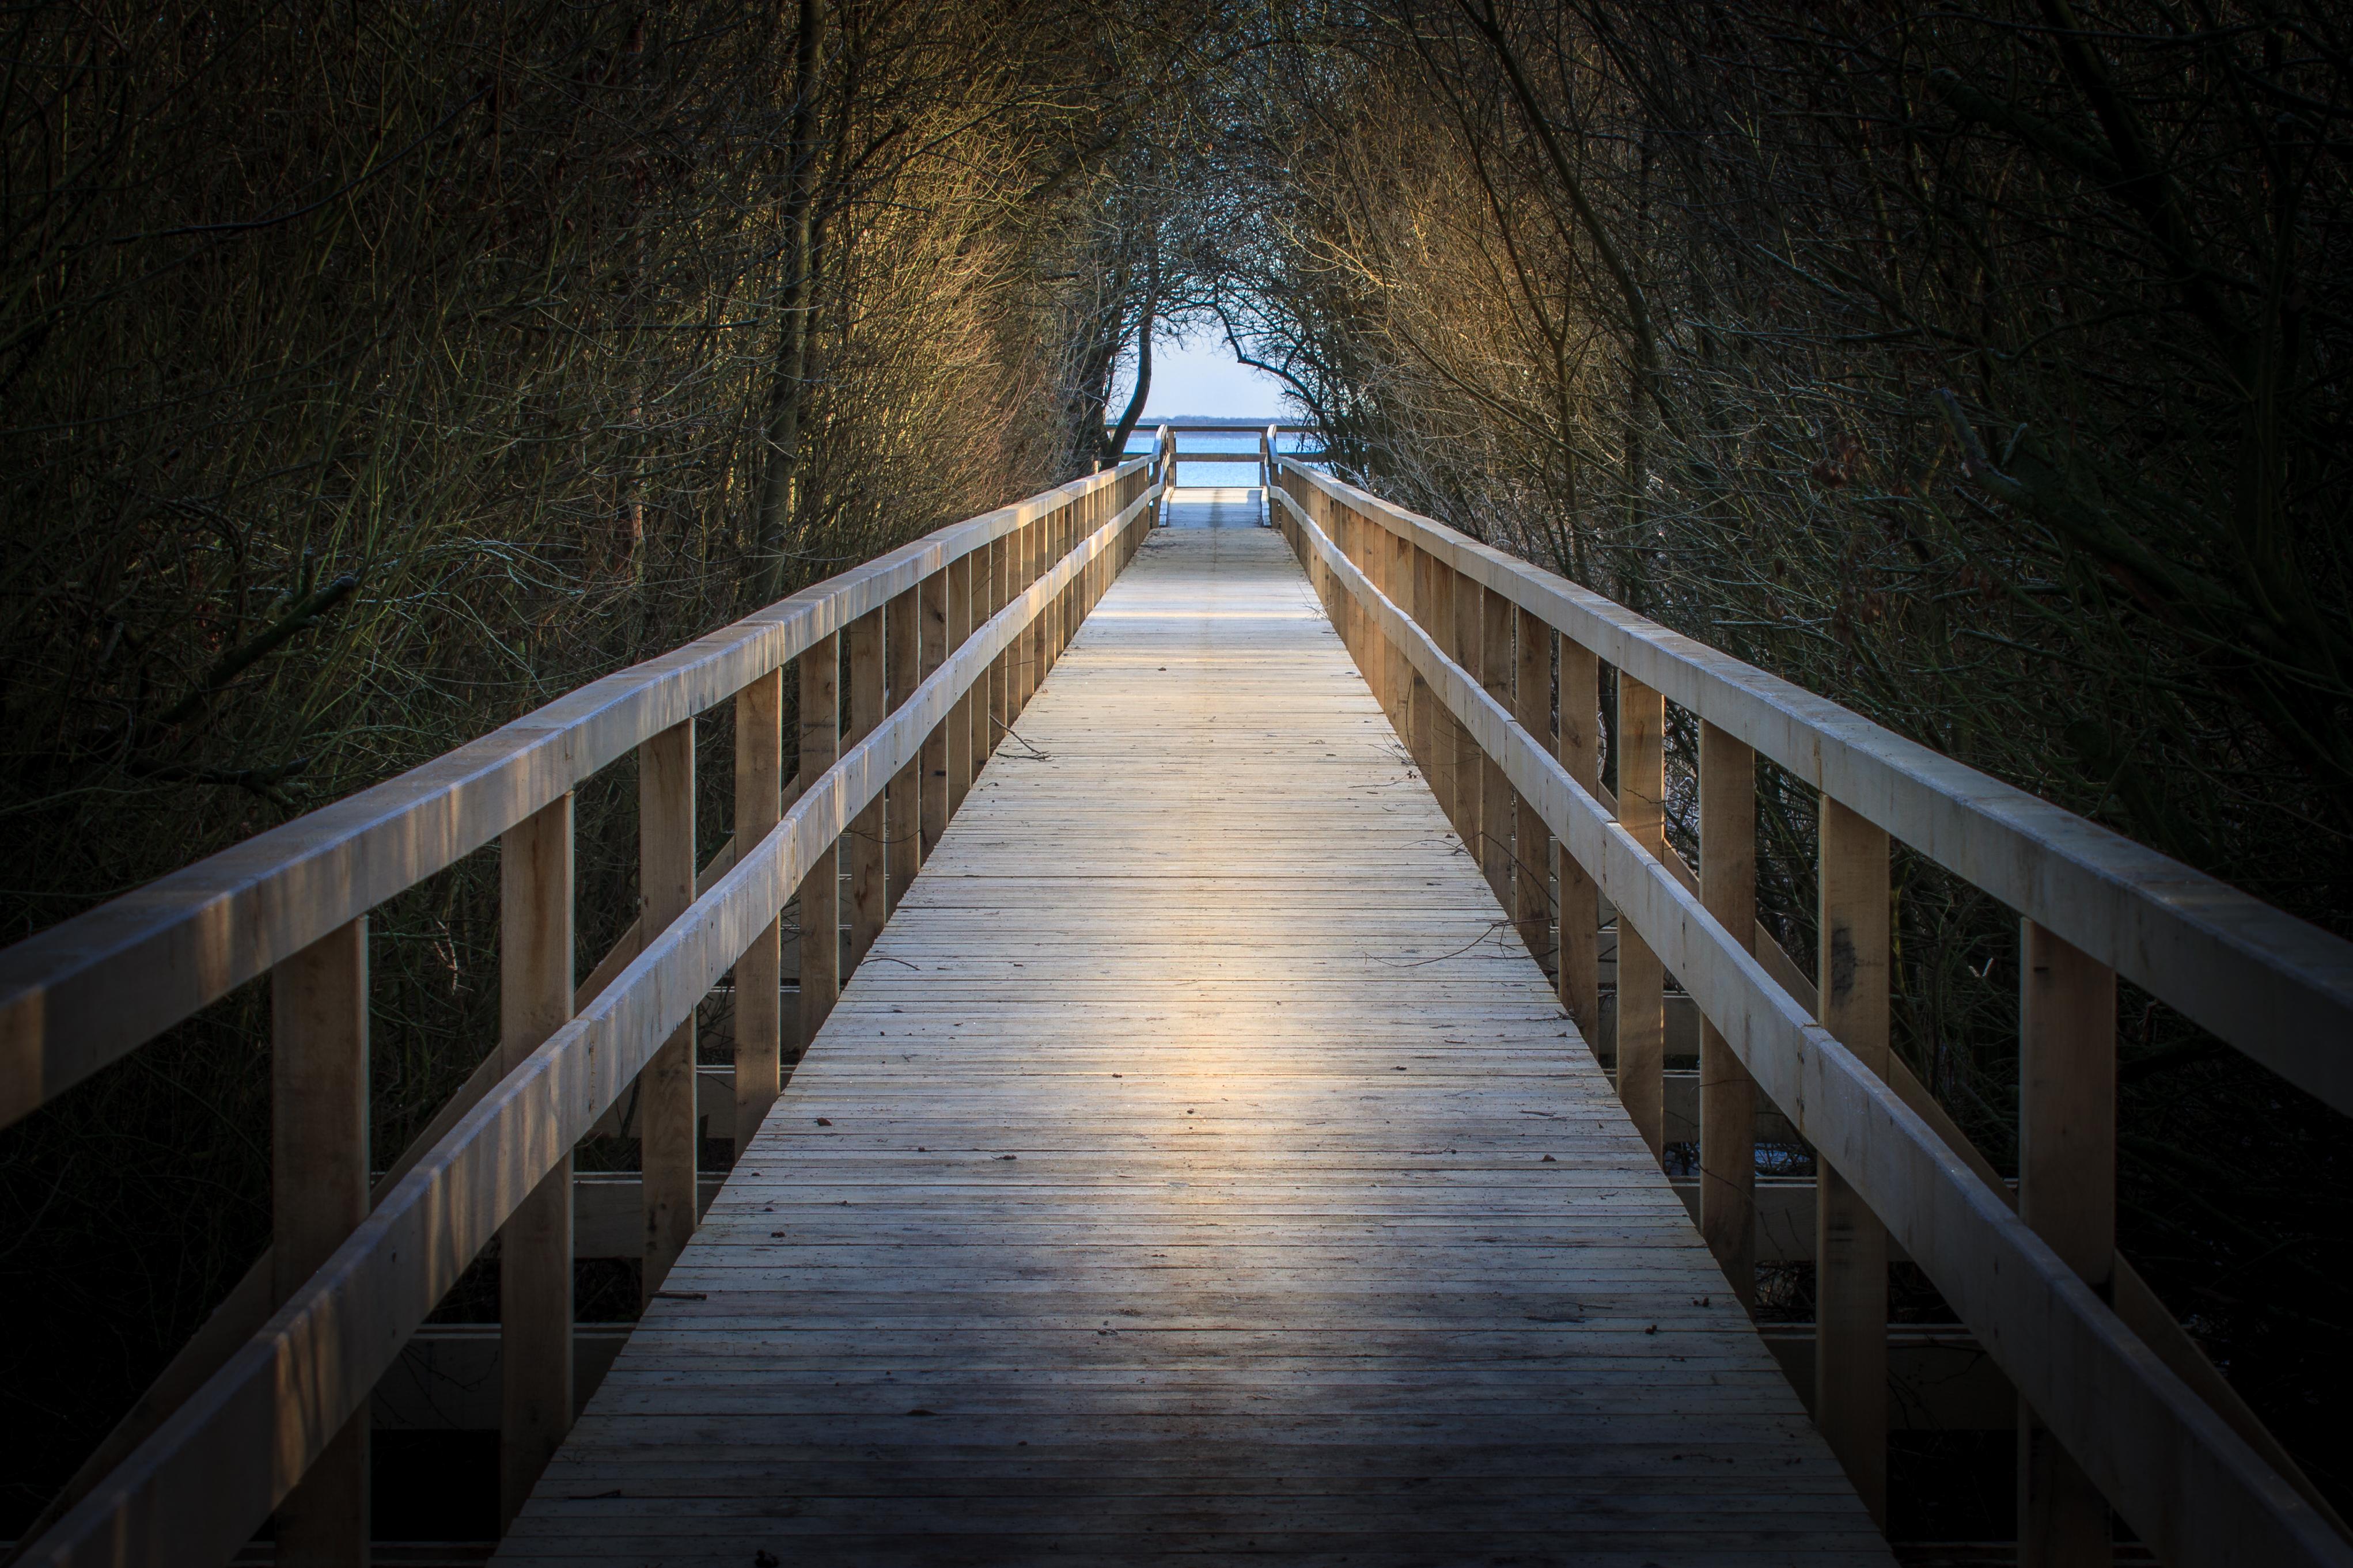 Weg zum Aussichtsturm Steinhuder Meer